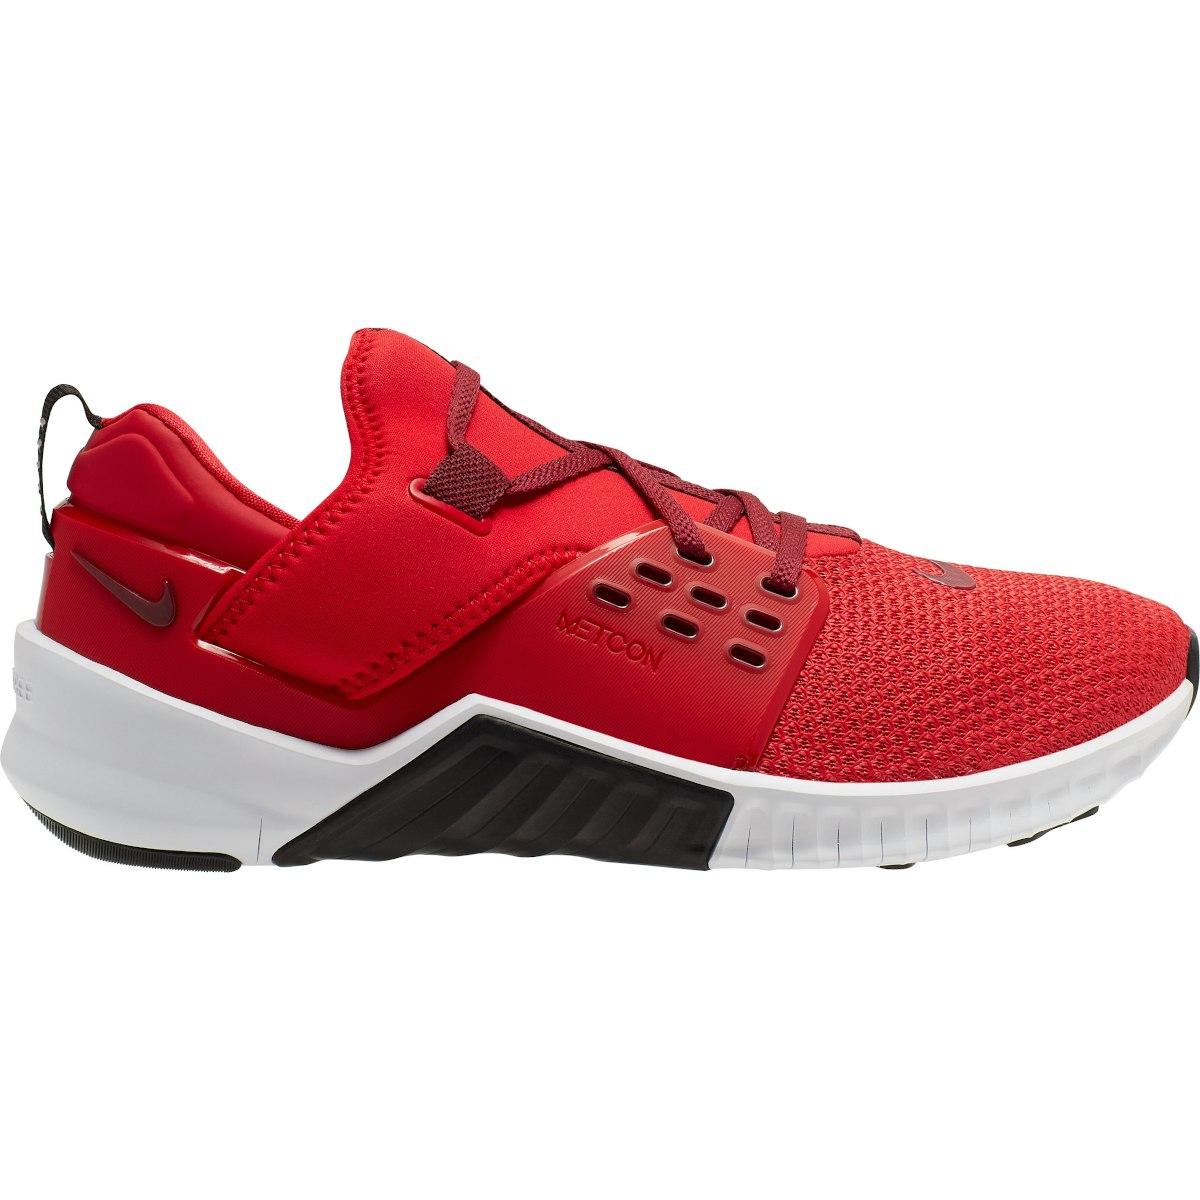 Foto de Nike Free X Metcon 2 Men's Training Shoe - university red/team red-black-white AQ8306-601